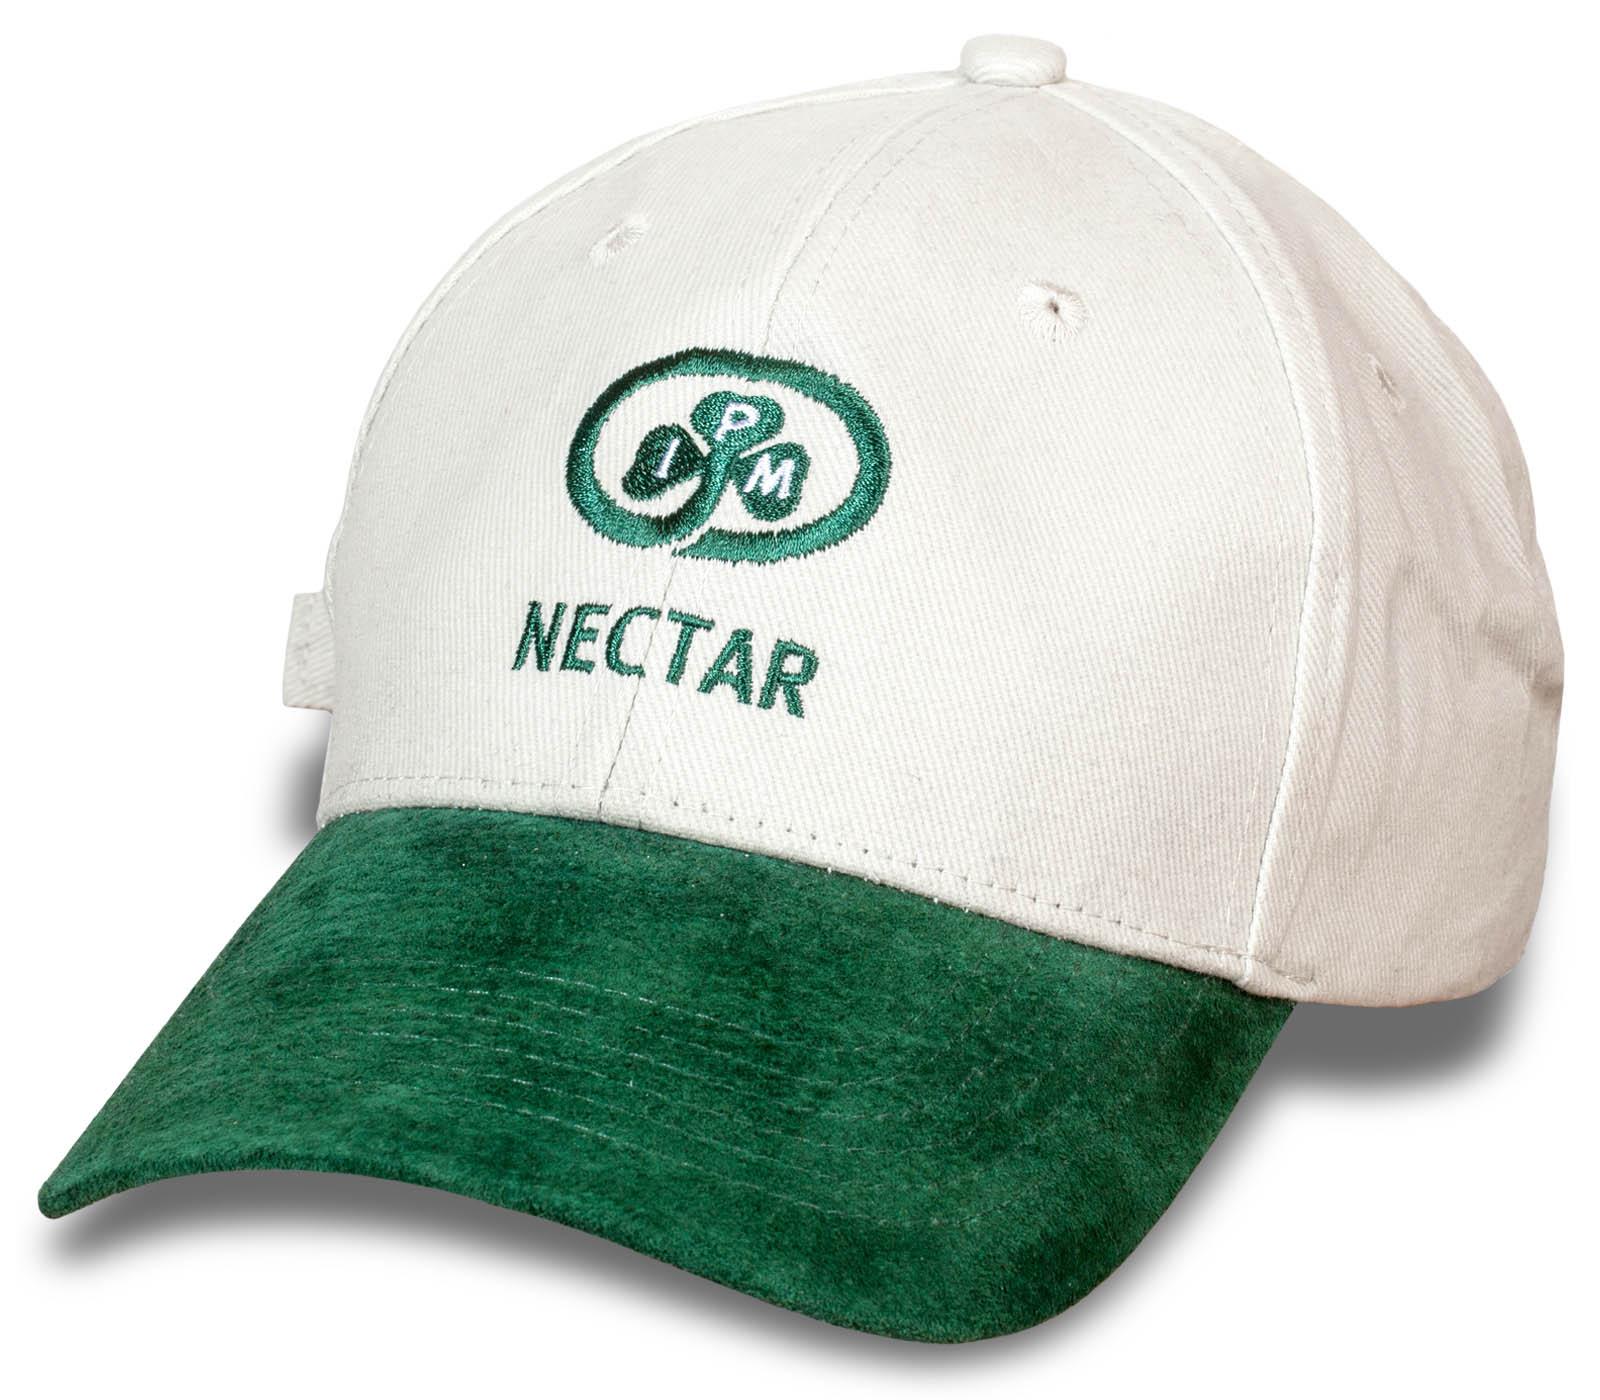 Трендовая кепка Nectar.